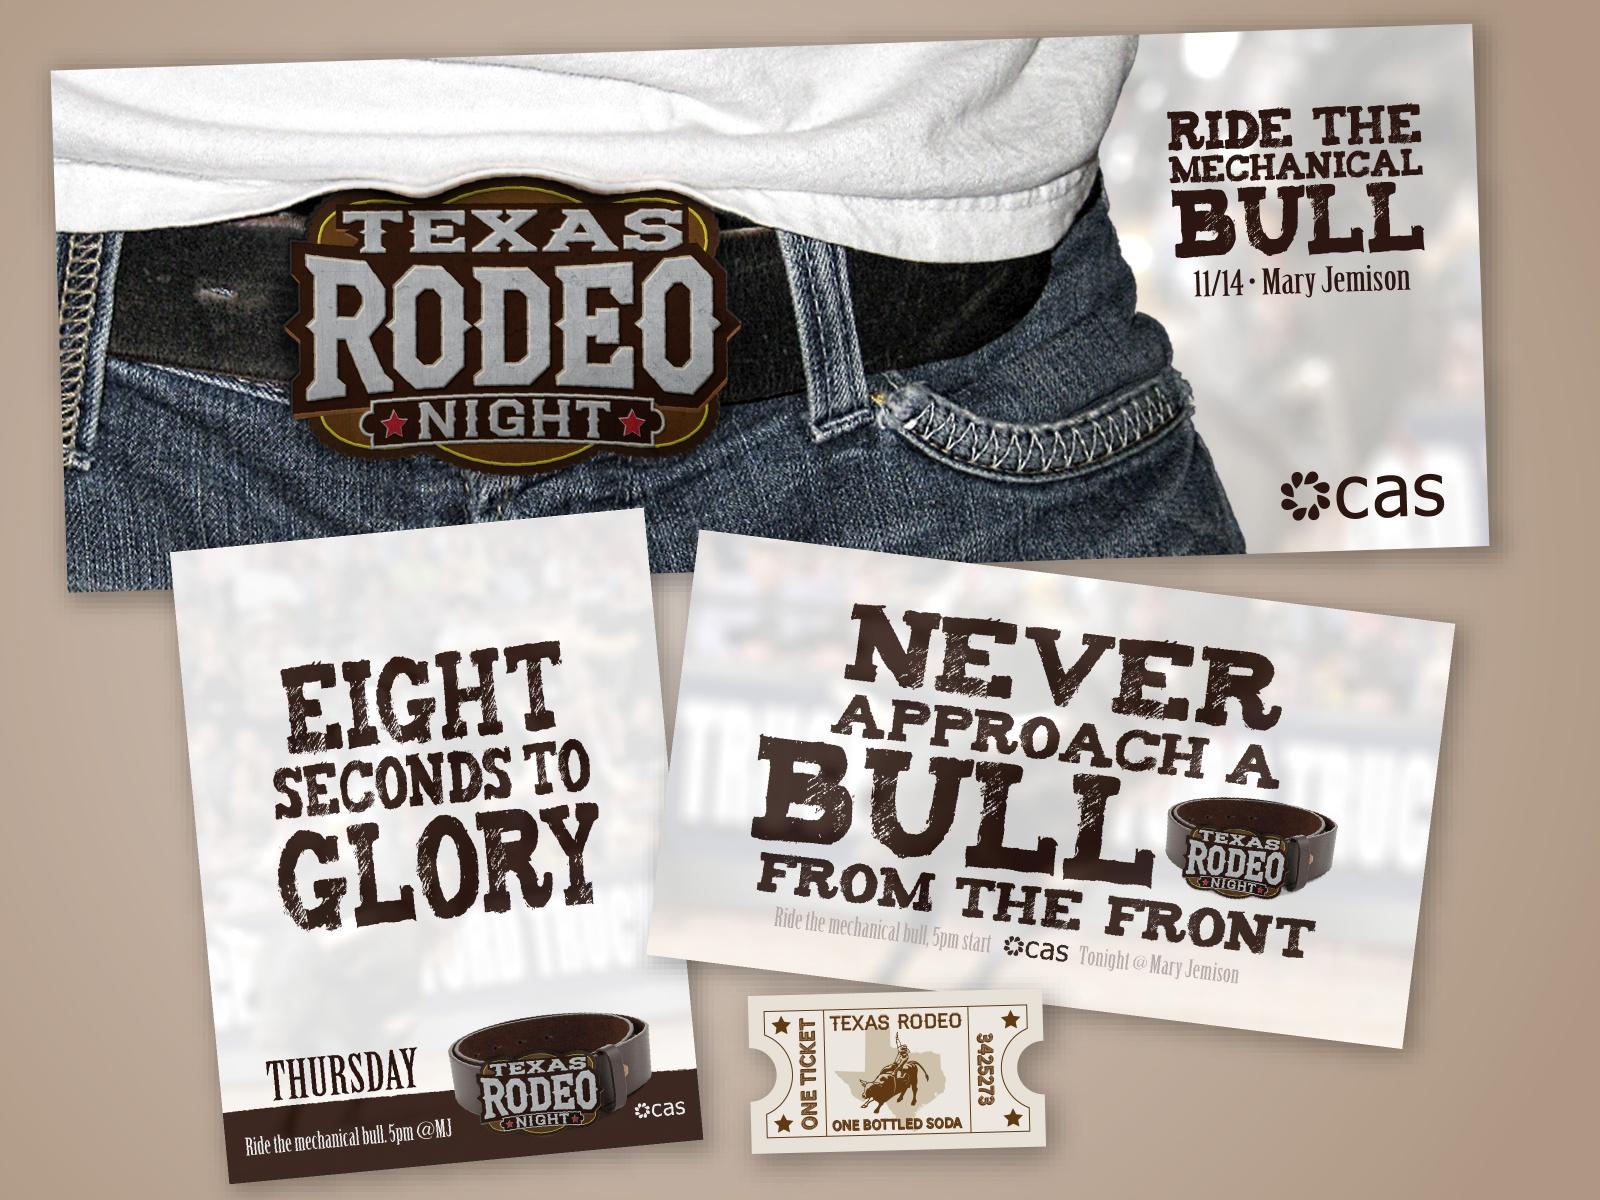 Texas Rodeo Event branding